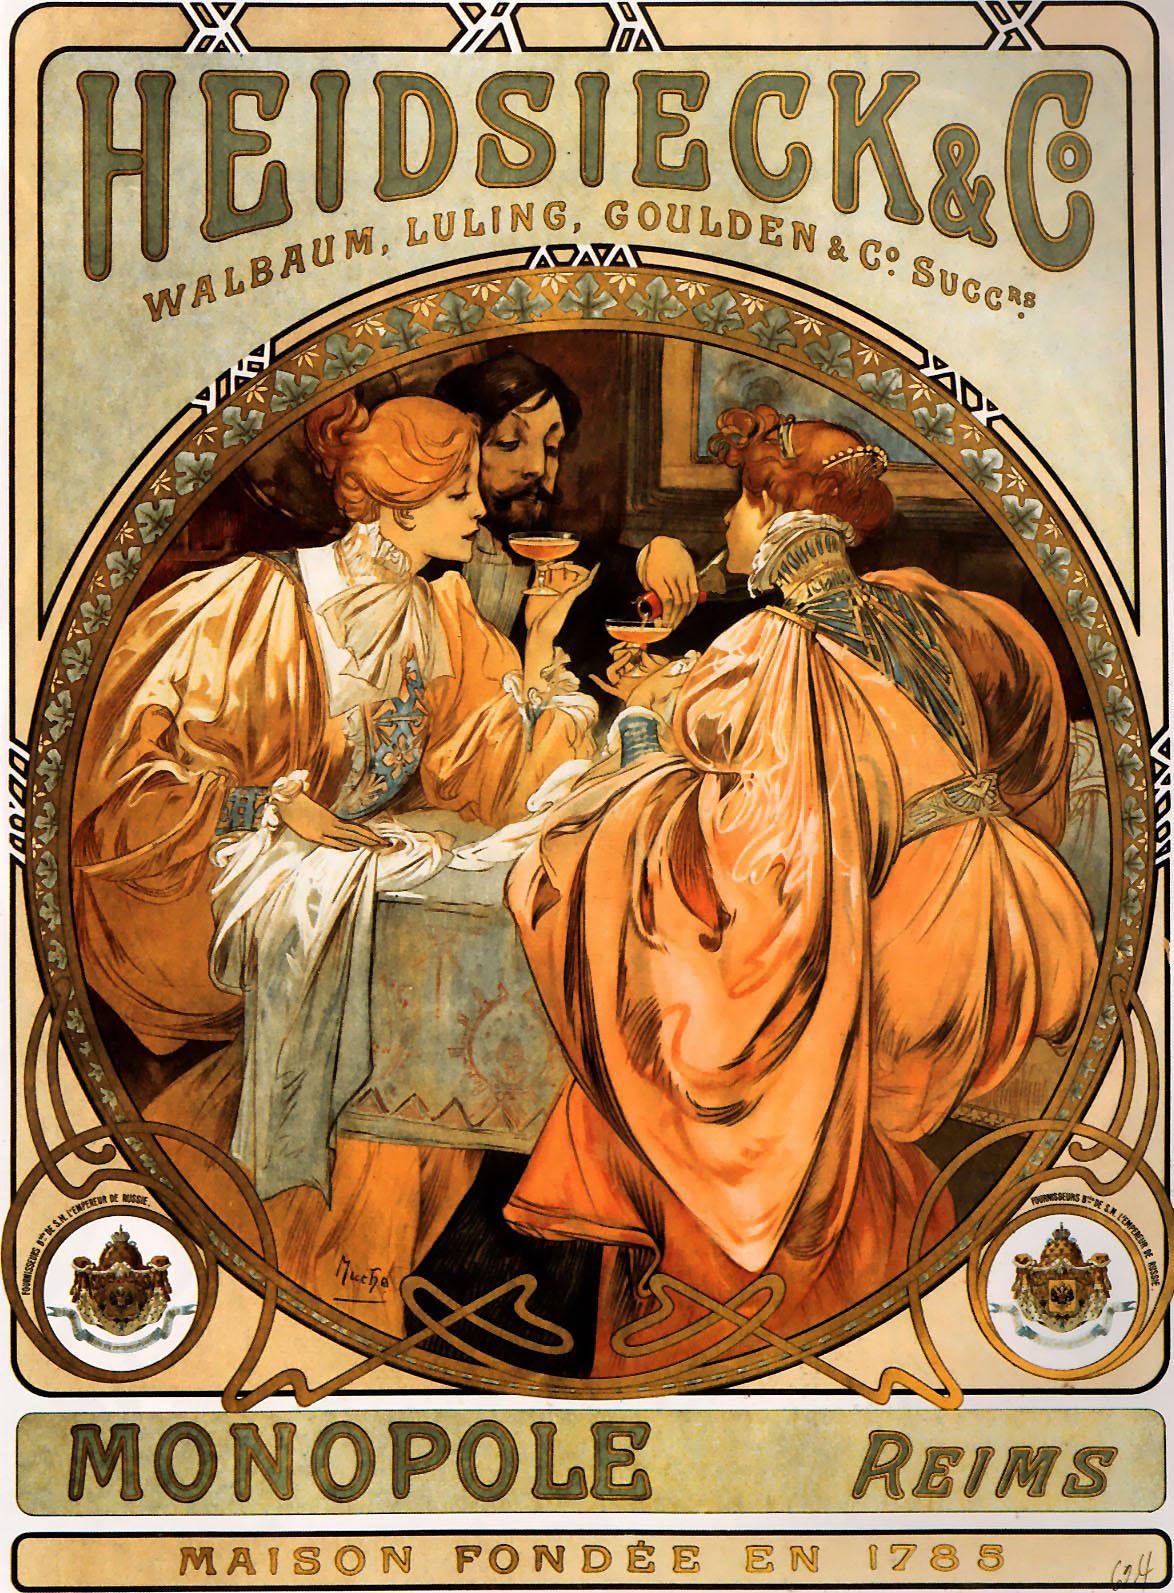 Плакат Heidsieck & Co.-1901